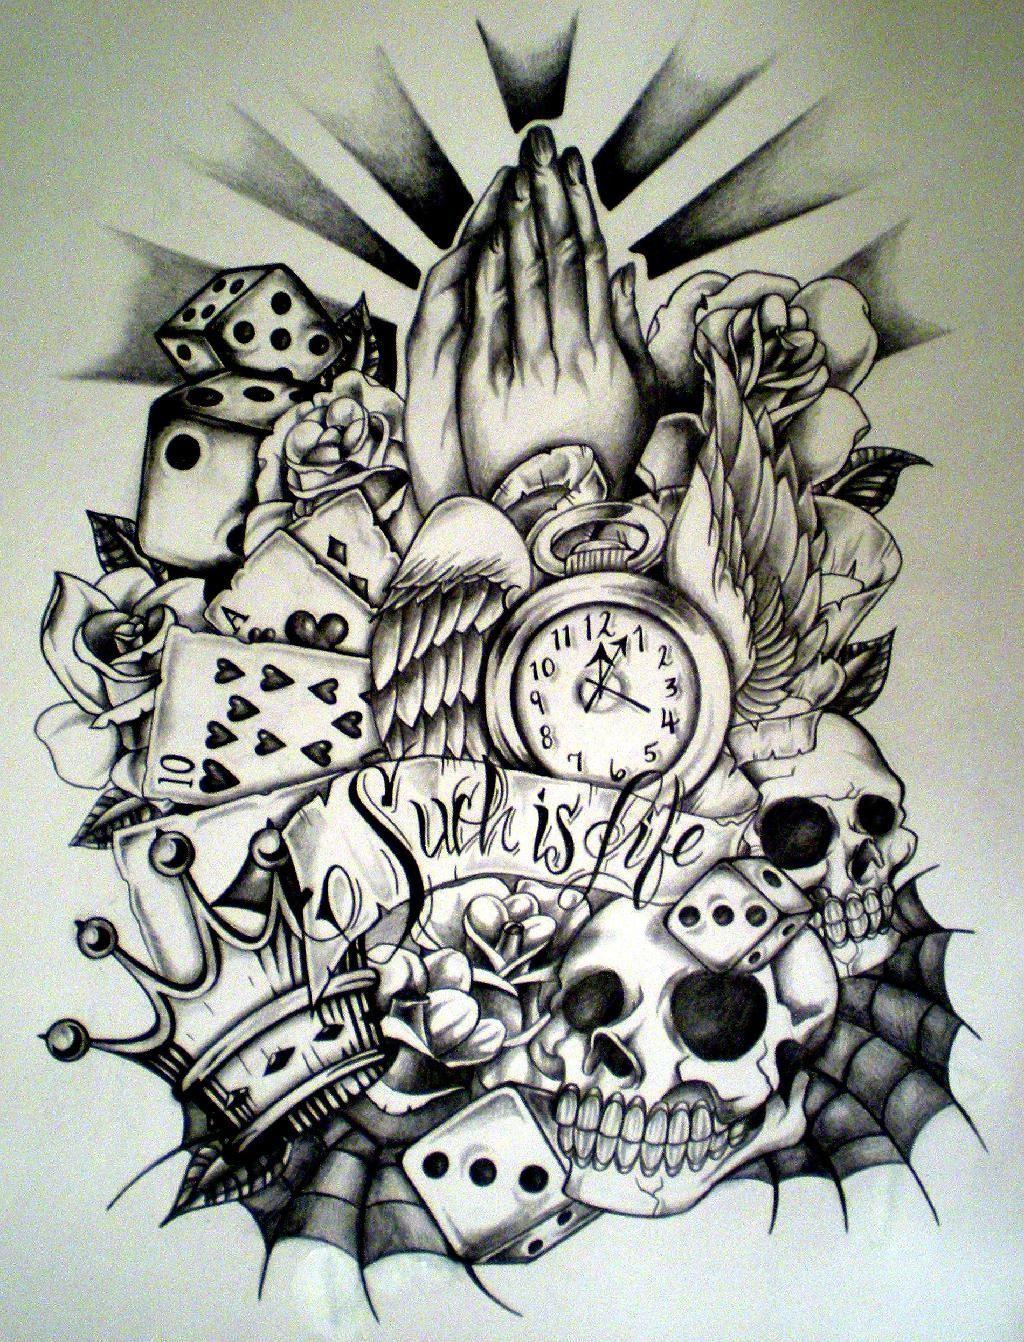 Half Sleeve Tattoo Designs Drawings For Men Google Search Half Sleeve Tattoos For Guys Half Sleeve Tattoo Tattoo Design Drawings